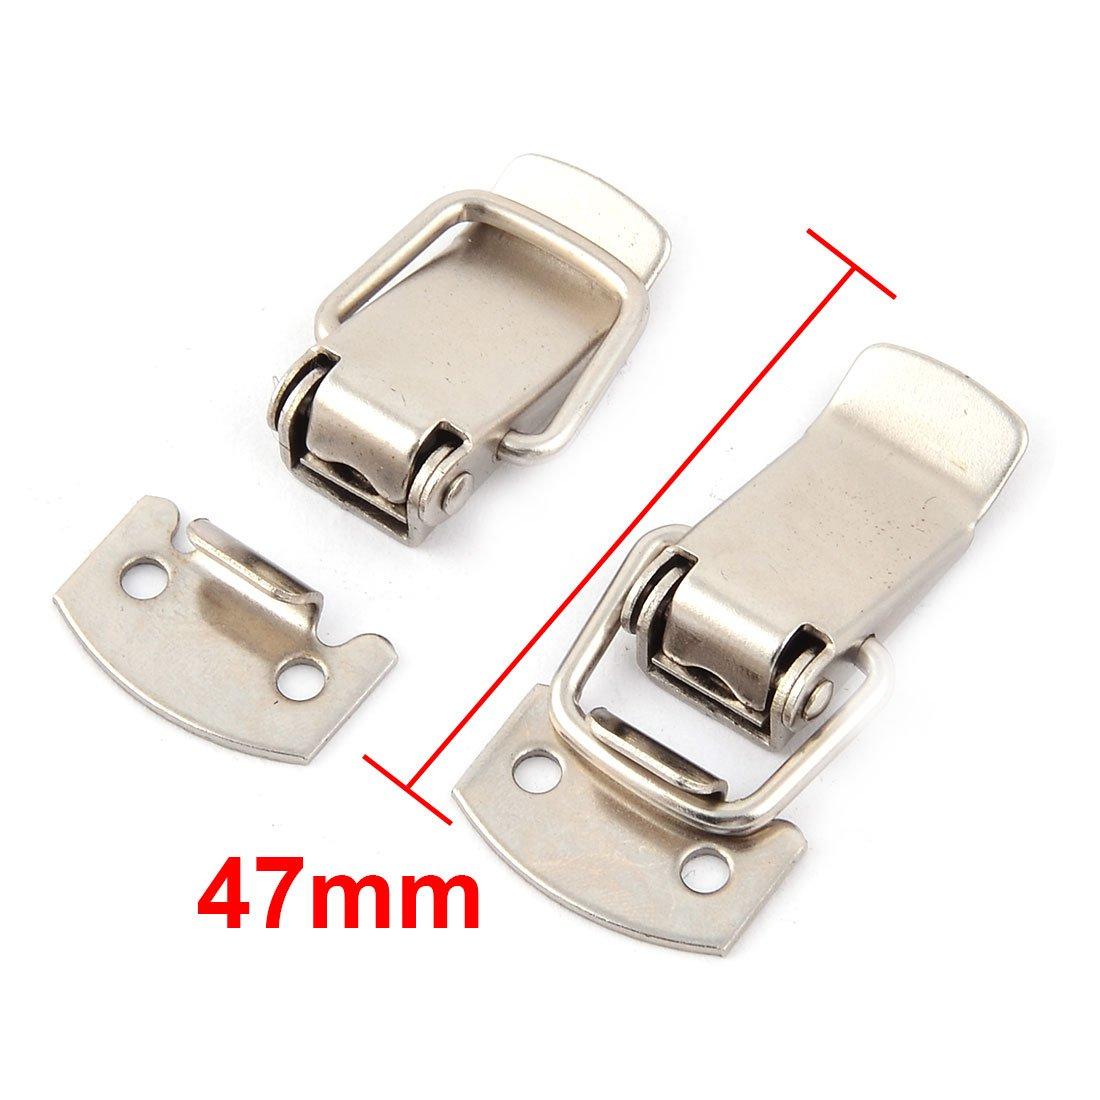 19 Sets Werkzeugkasten Metallschnalle Umschalten Verriegeln Sperren Haspe 47mm de